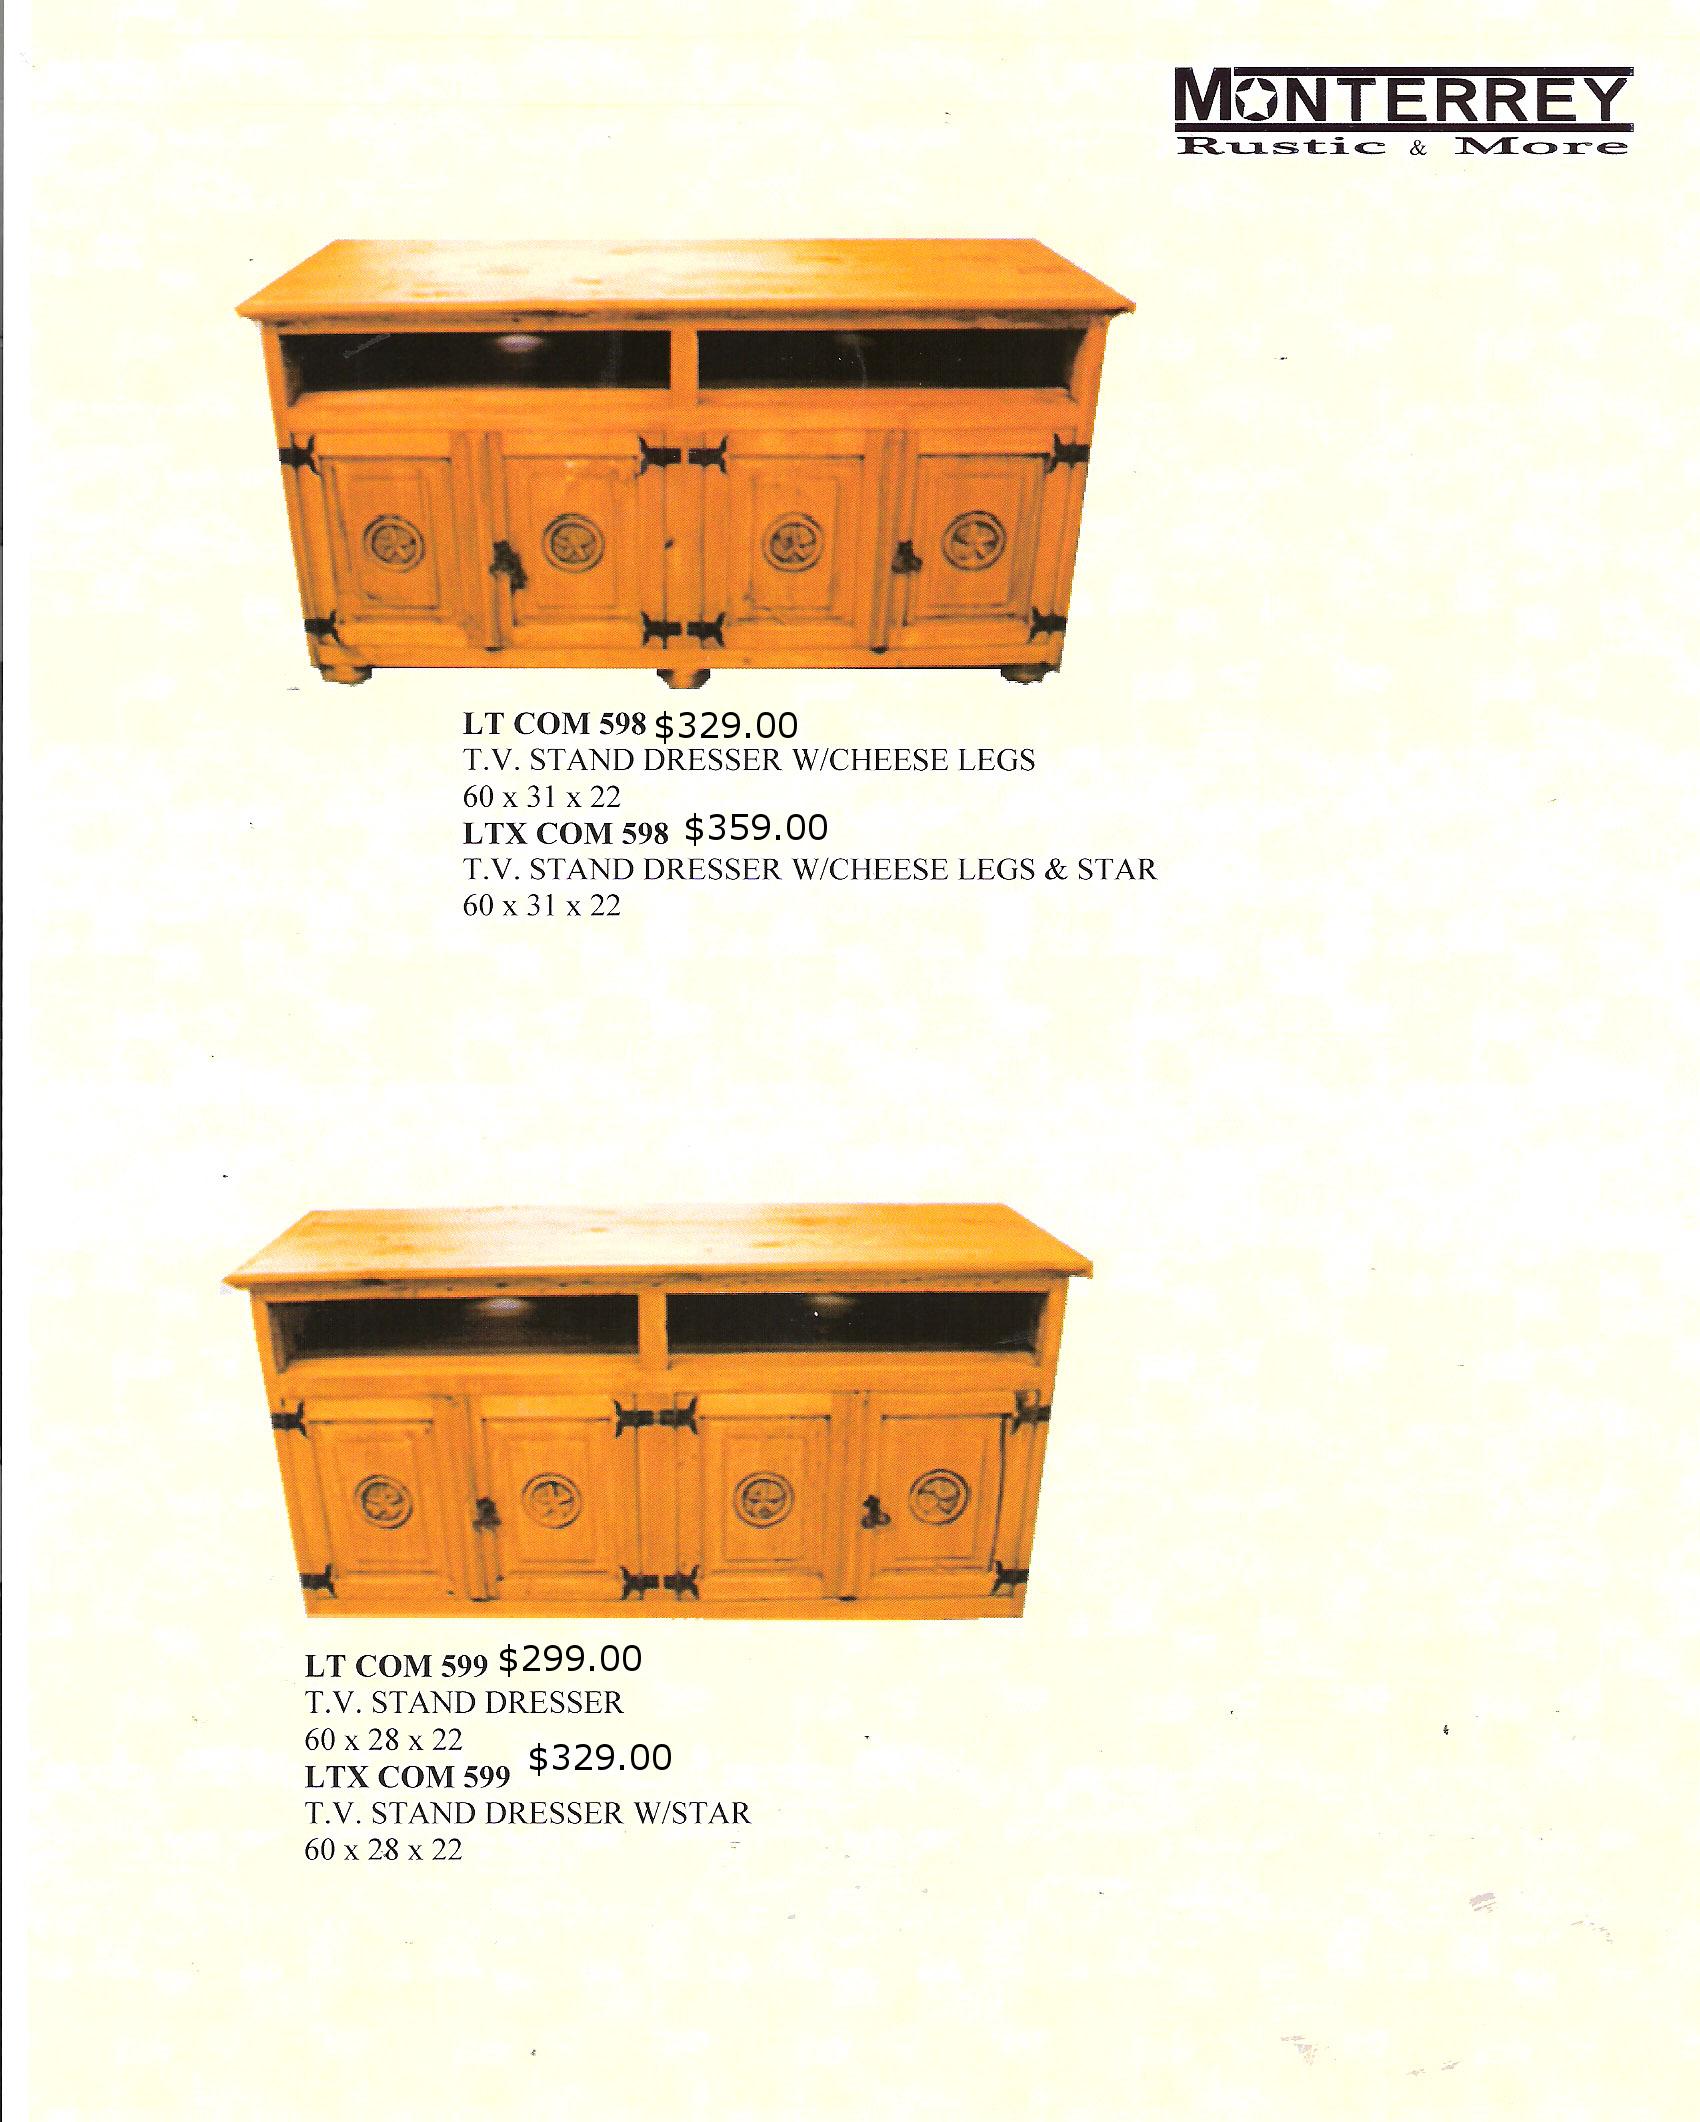 Tv Stand Dressers Monterrey Rustic Furniture